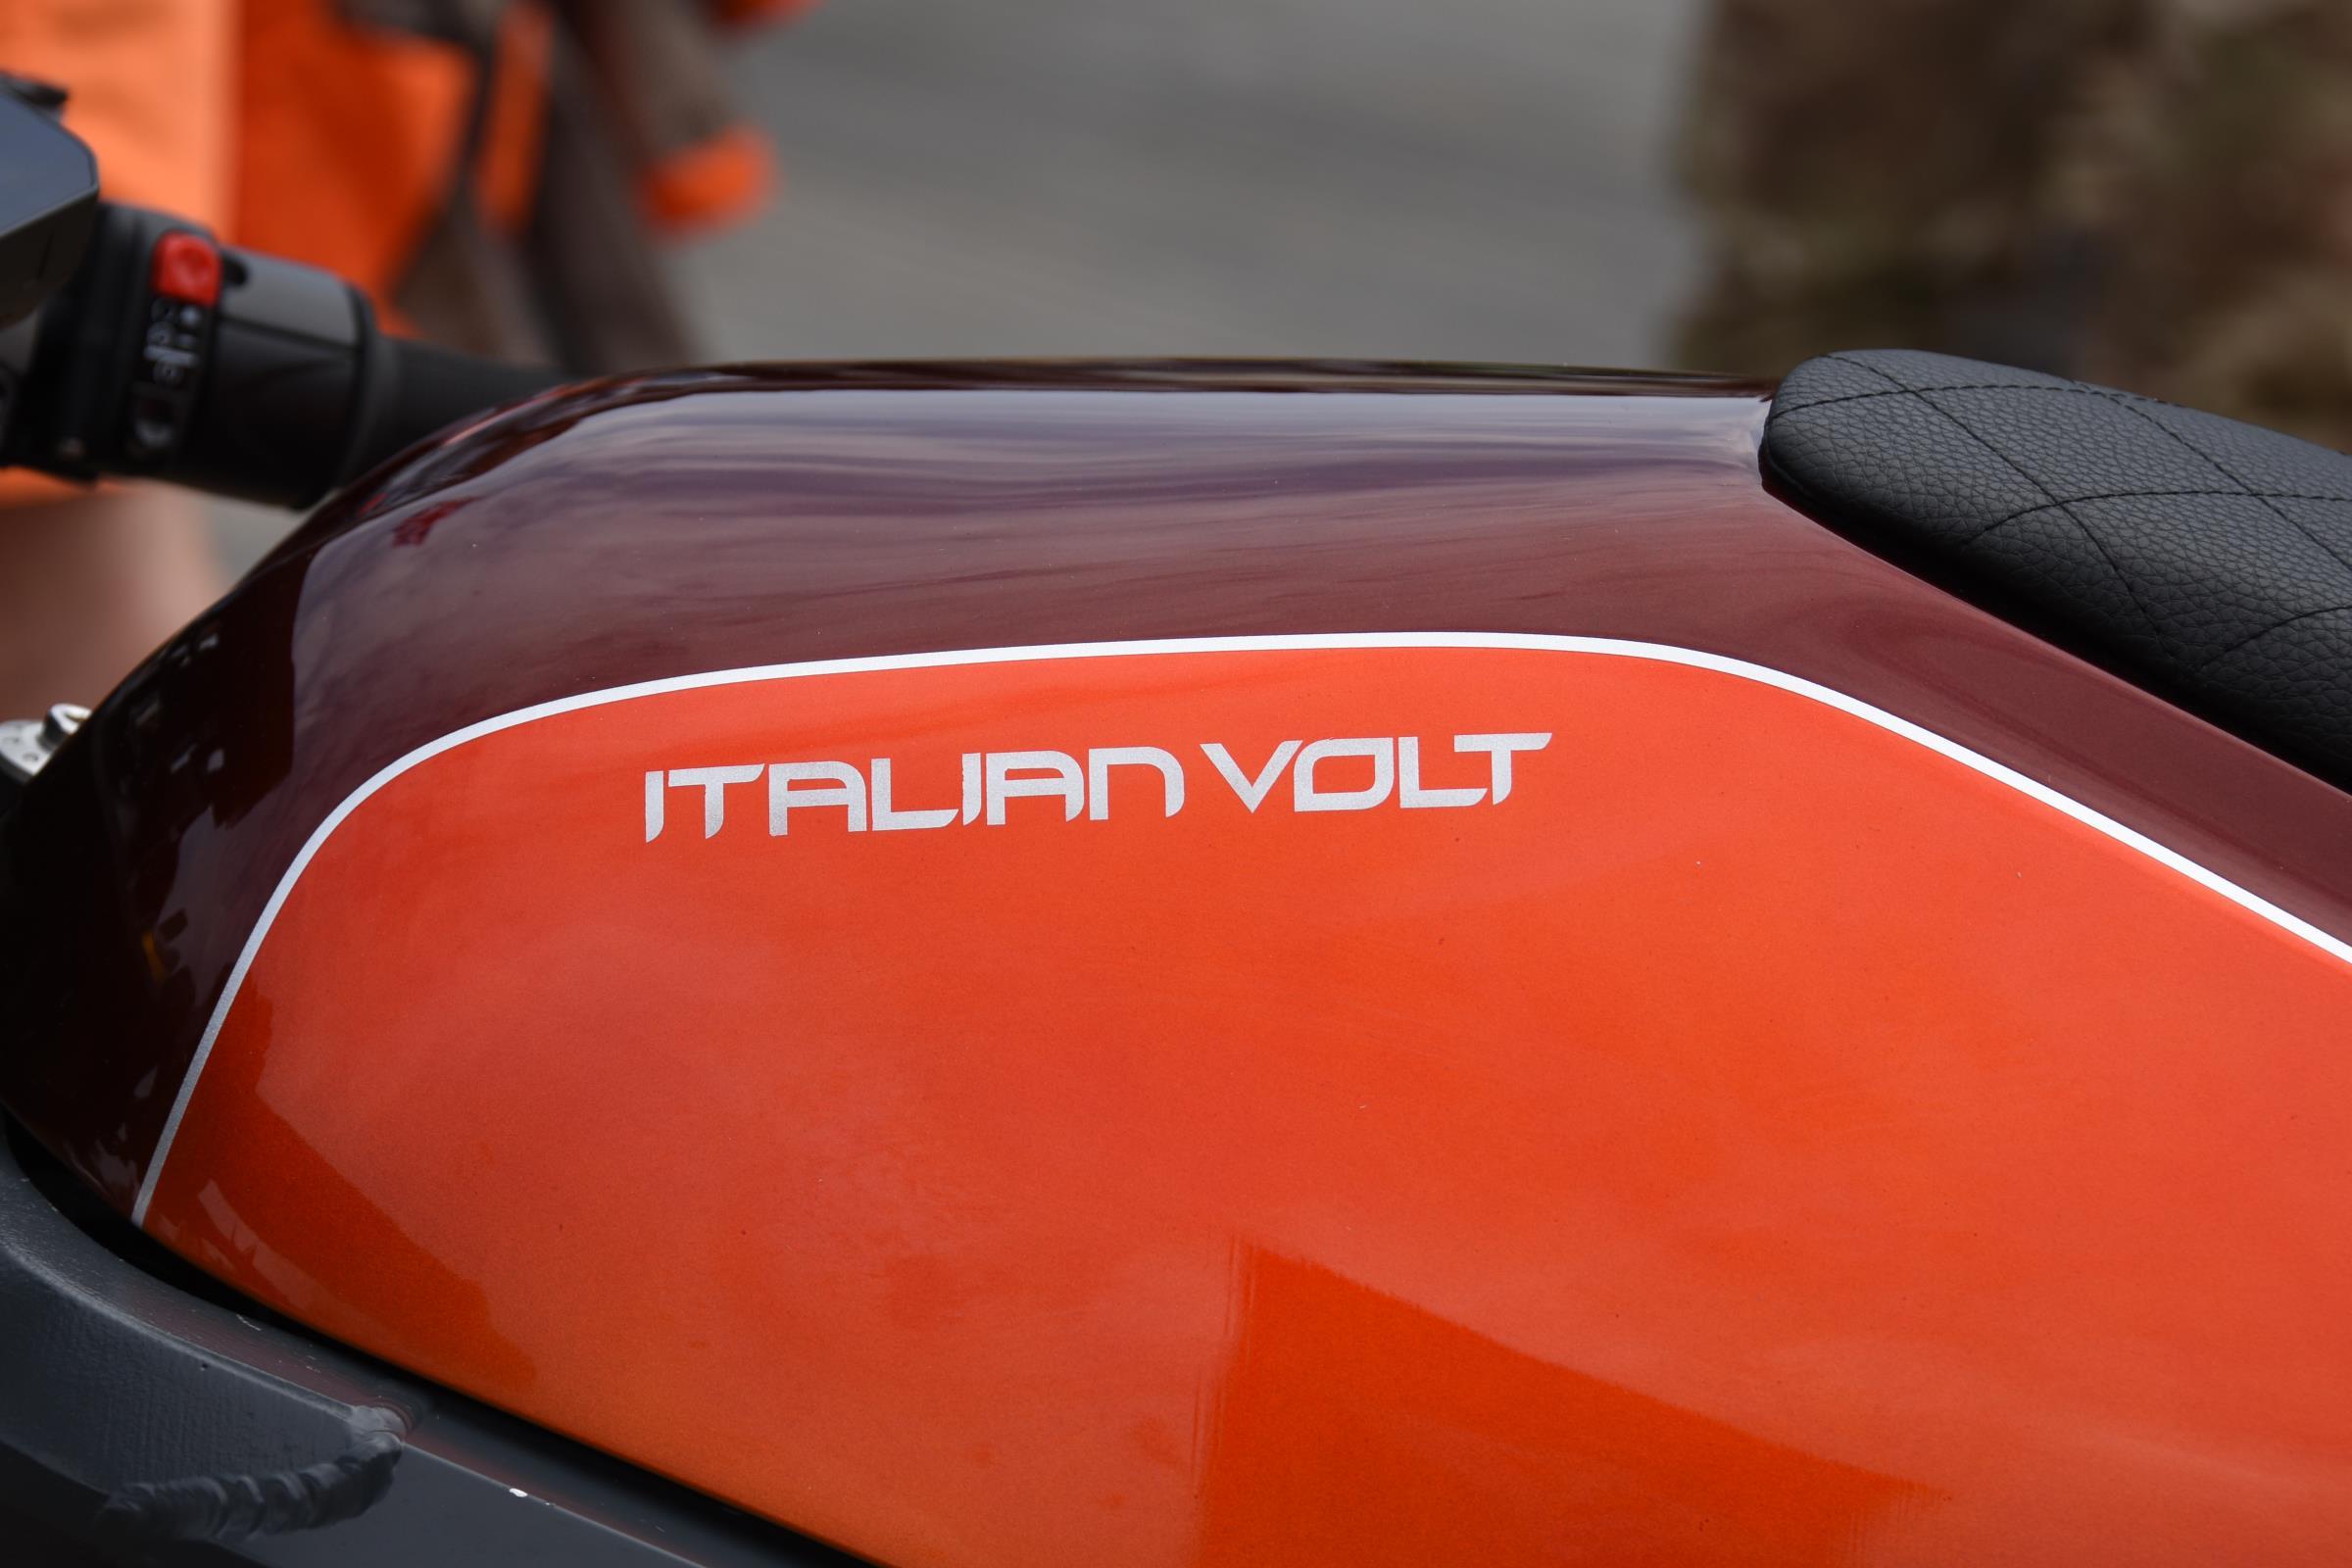 italian_volt_electric_motor_news_34